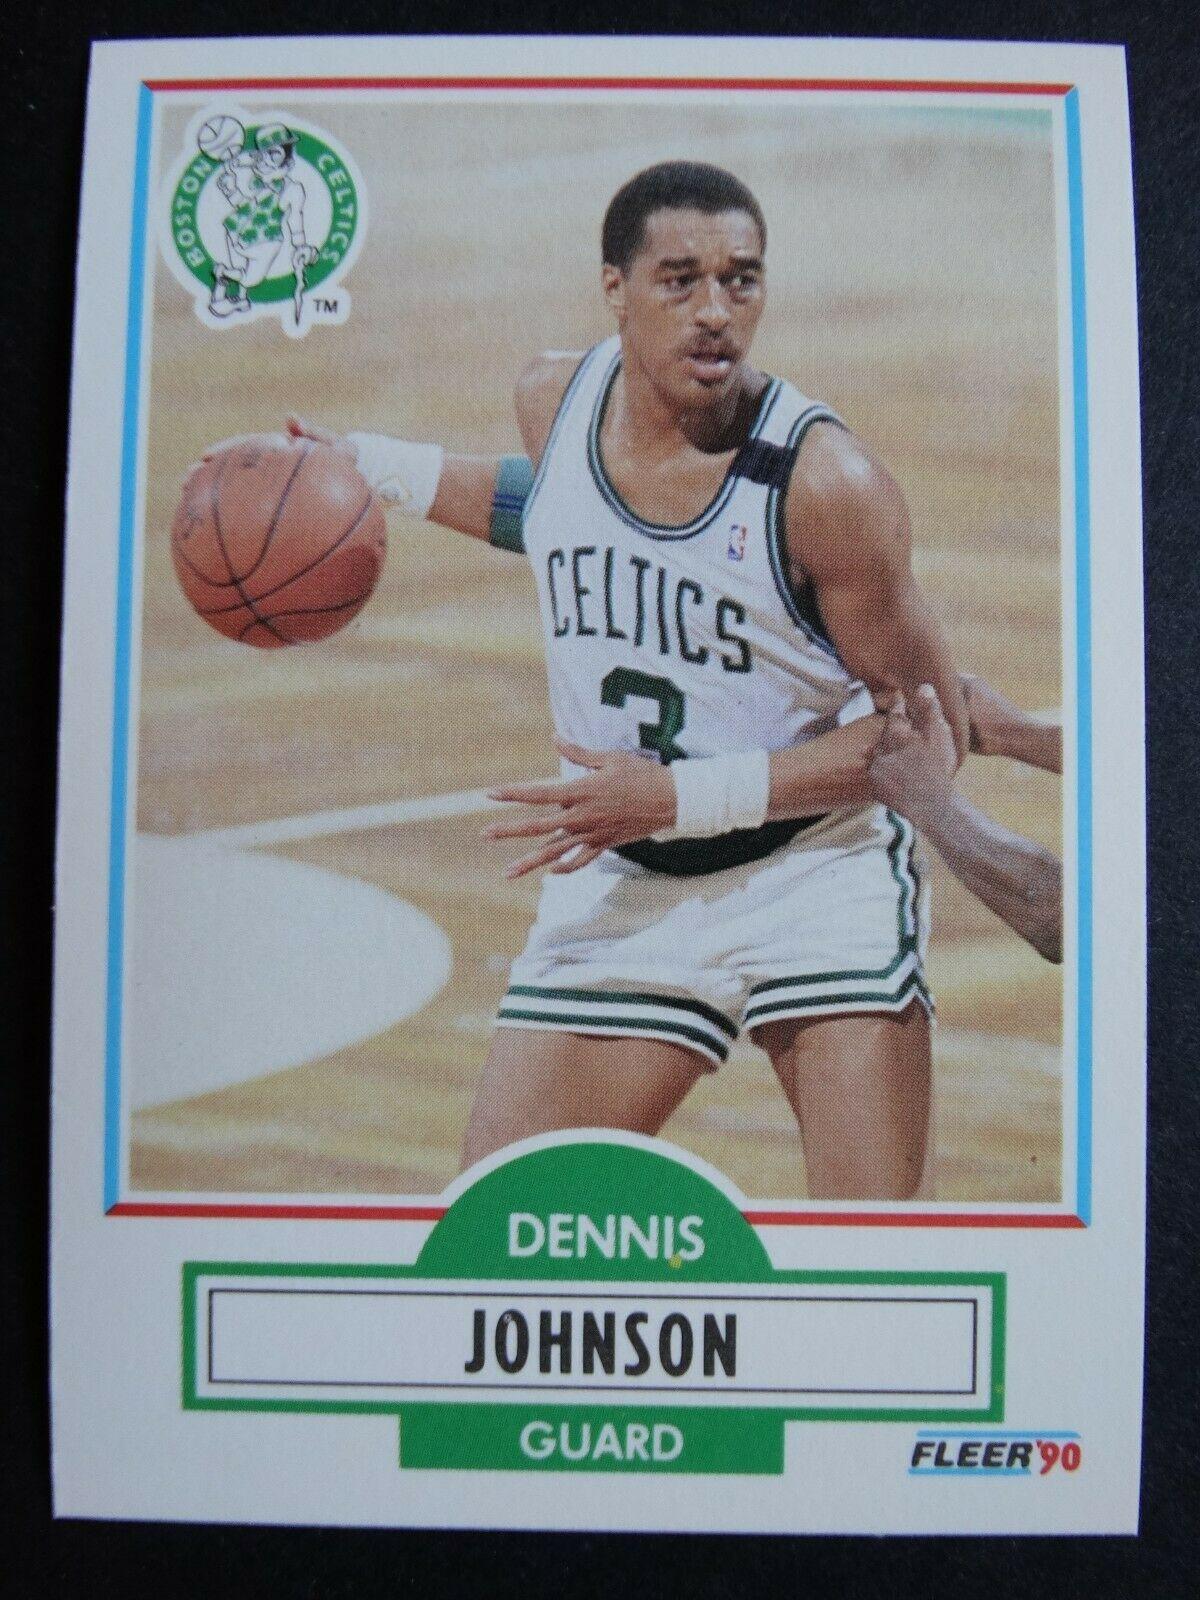 1990-91 Fleer Basketball Cards All-stars Complete Your Set You U Pick List 1-198